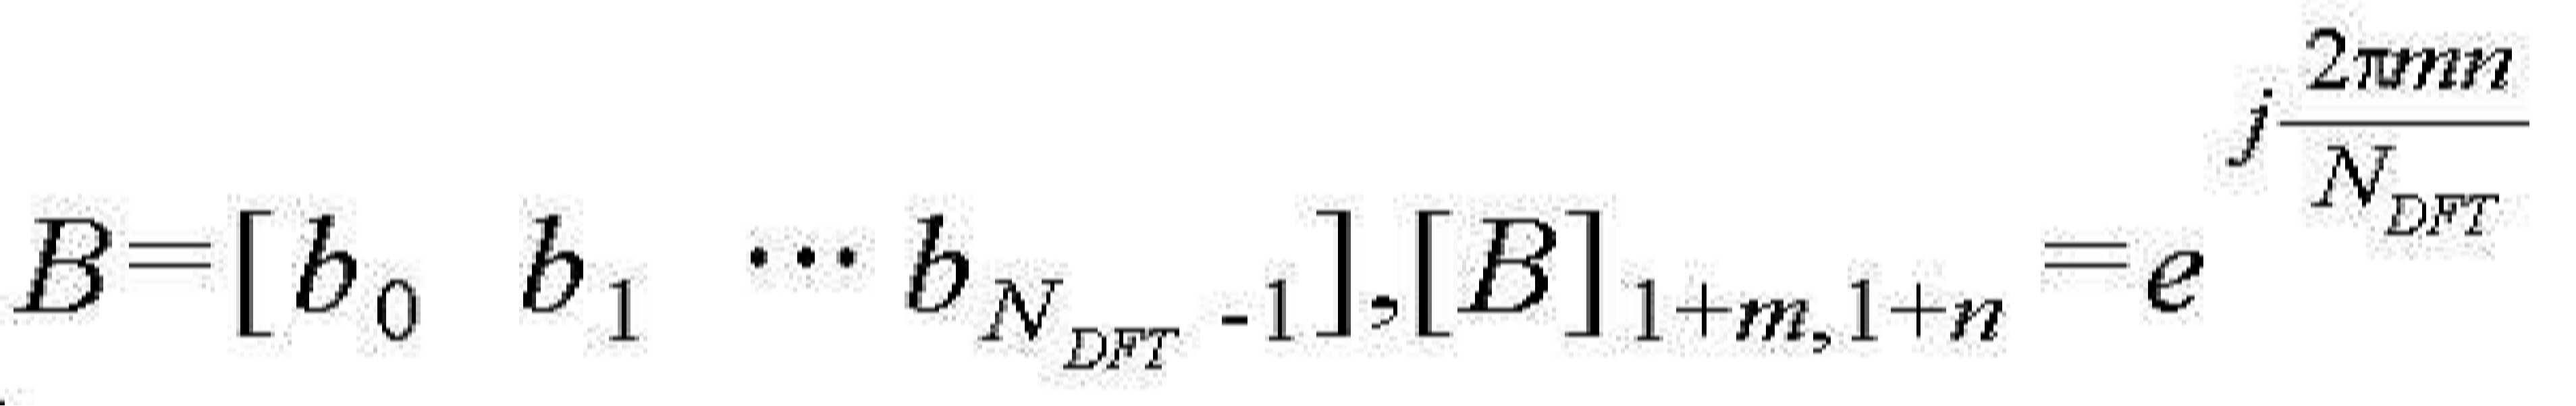 Figure 112019051199313-pct00071